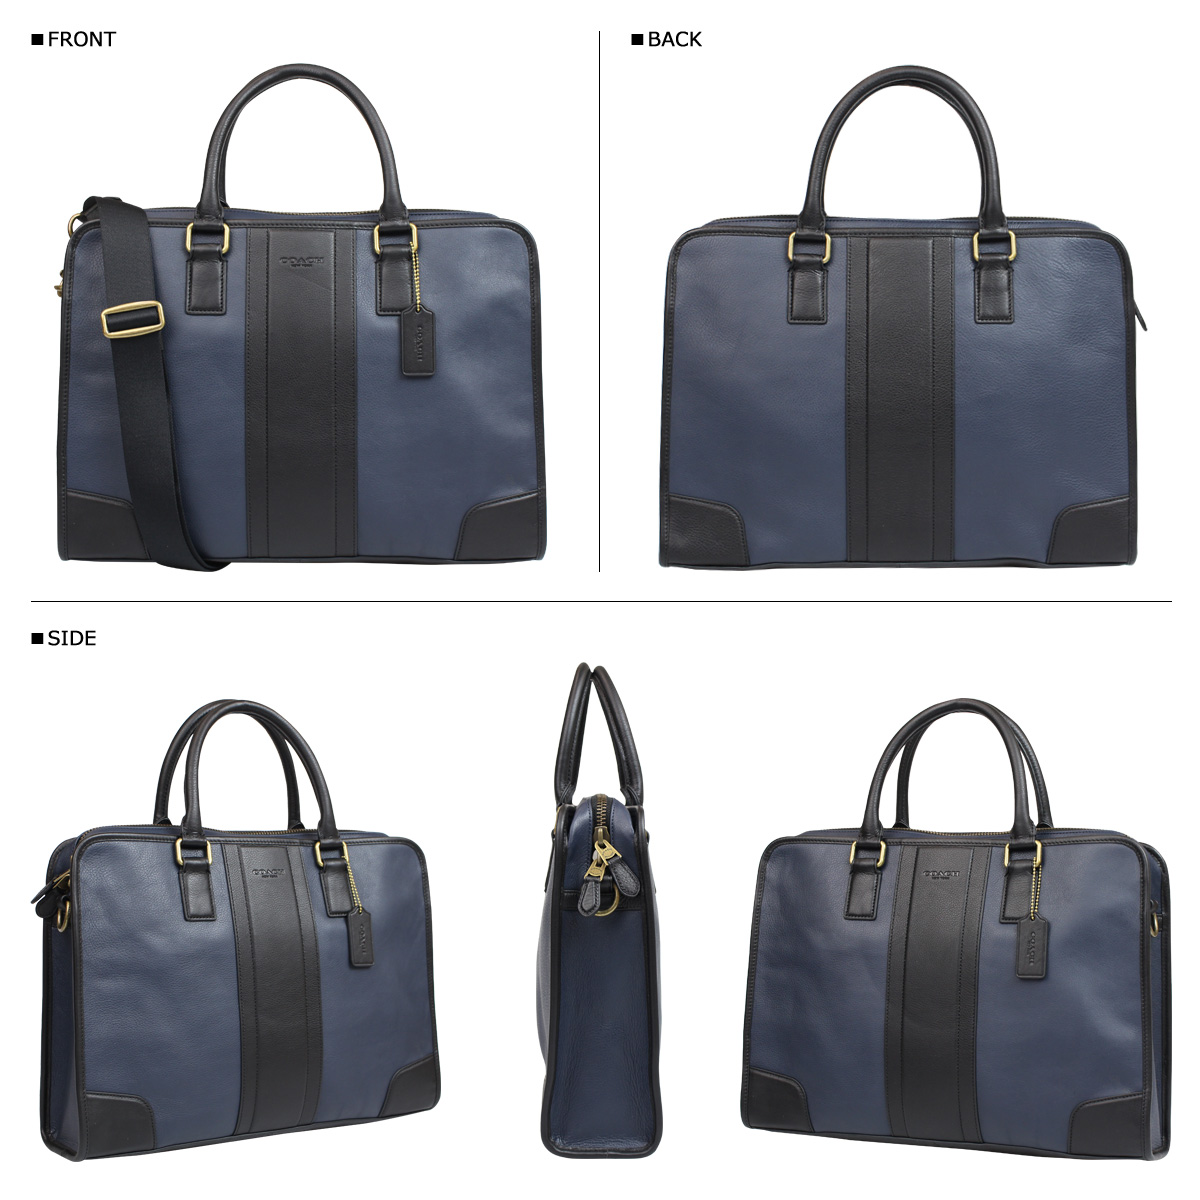 Coach COACH bag business bag Briefcase men's F71639 Navy / Black bomb leather Director's